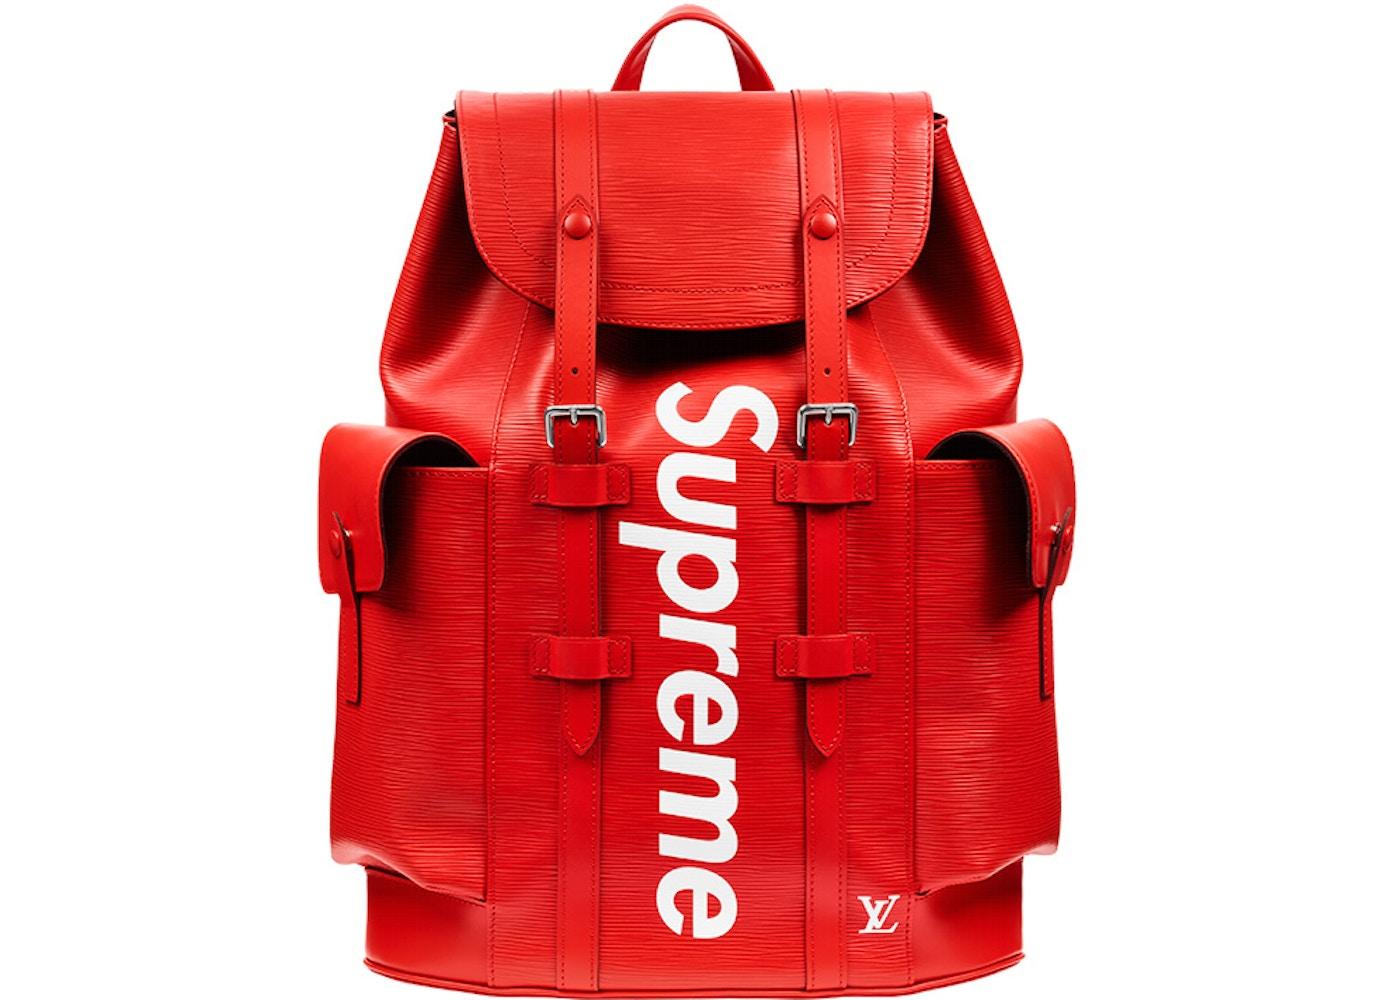 130292be05fb Buy   Sell Louis Vuitton Supreme Handbags